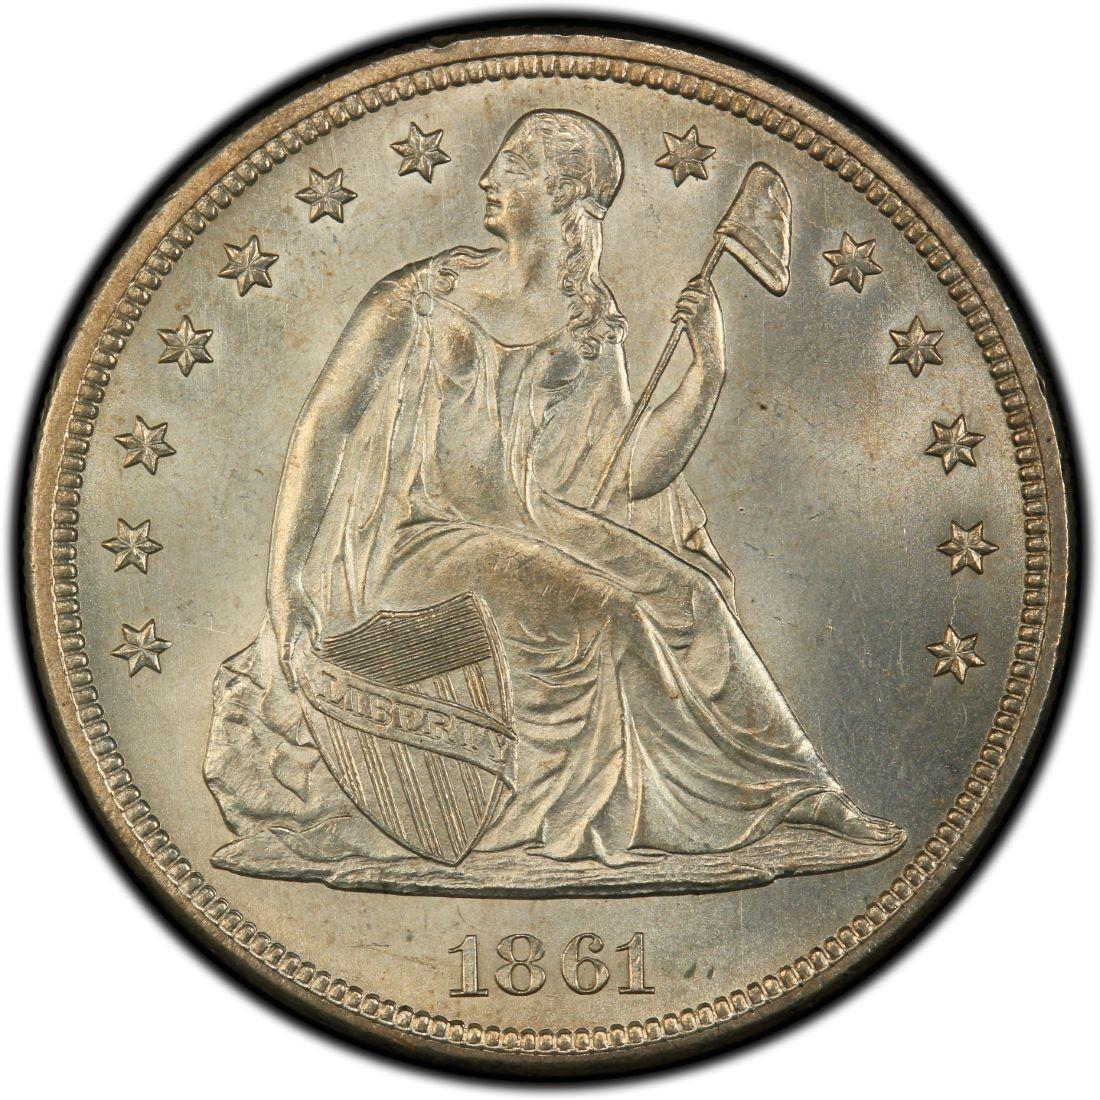 1861 Seated Liberty Silver Dollar